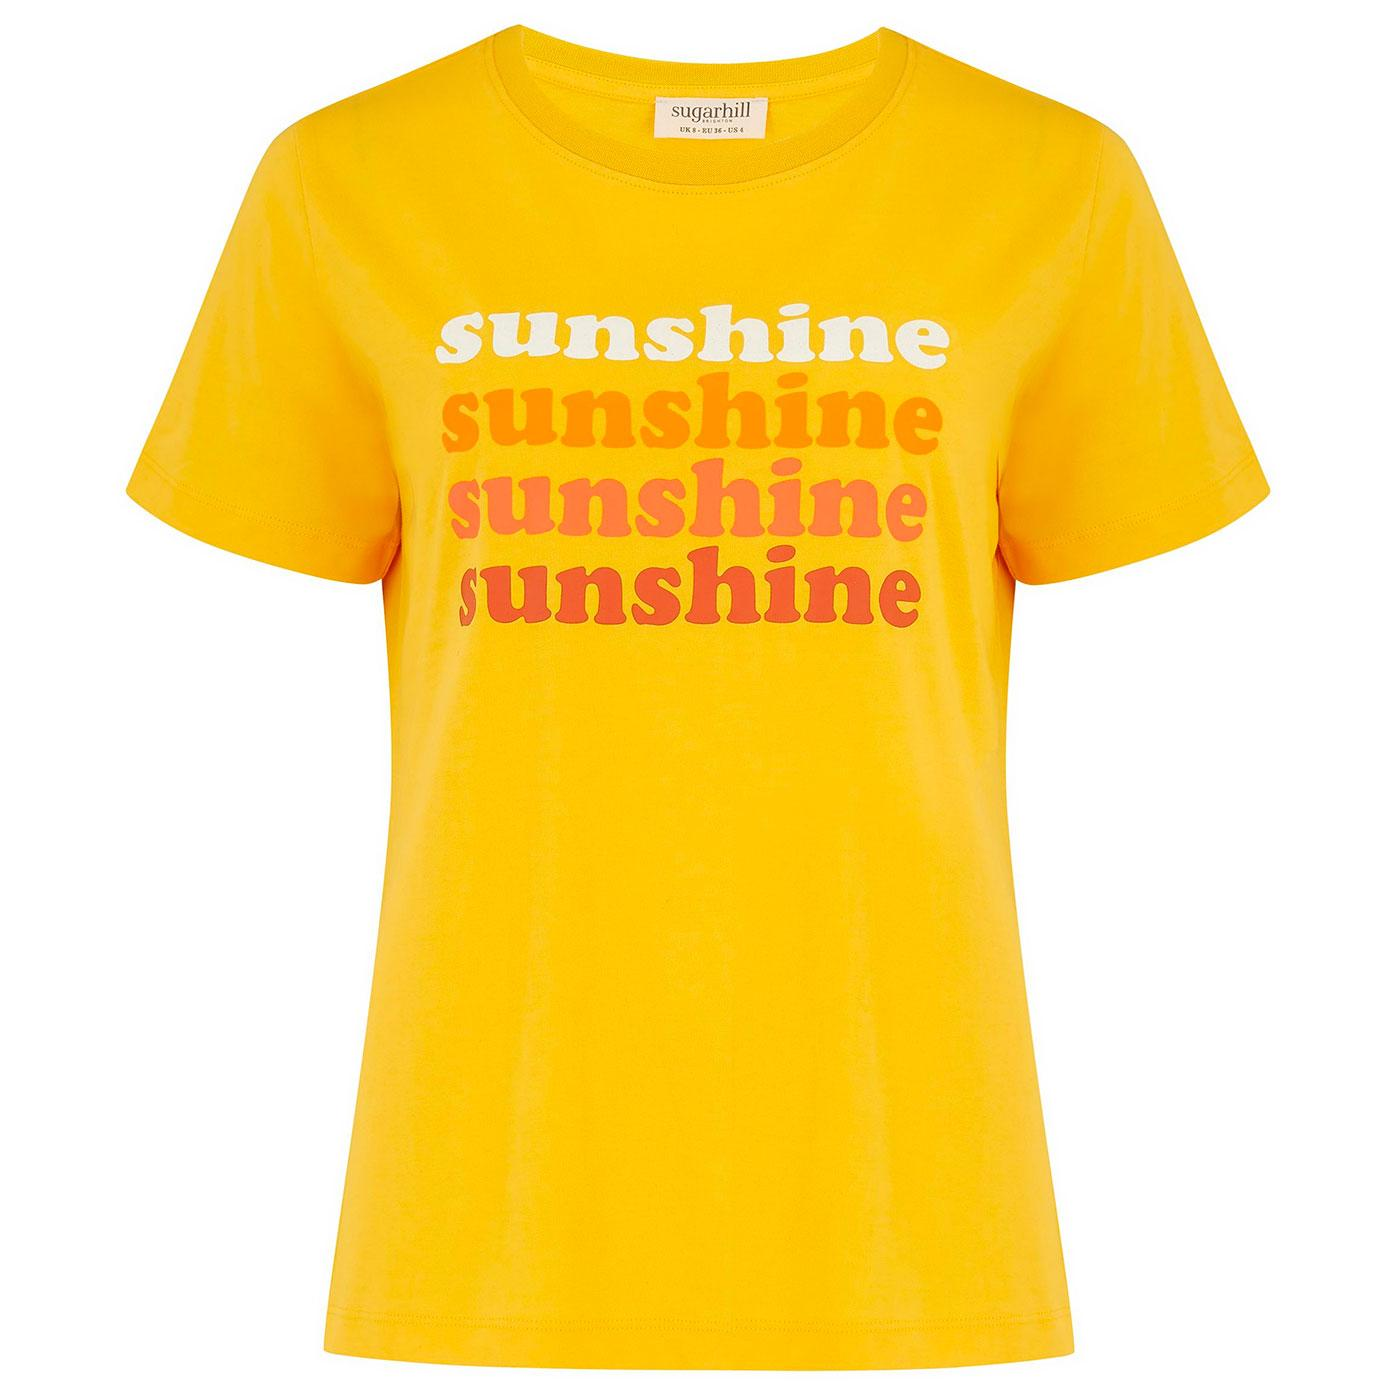 Maggie SUGARHILL Sunshine Summer Retro T-Shirt